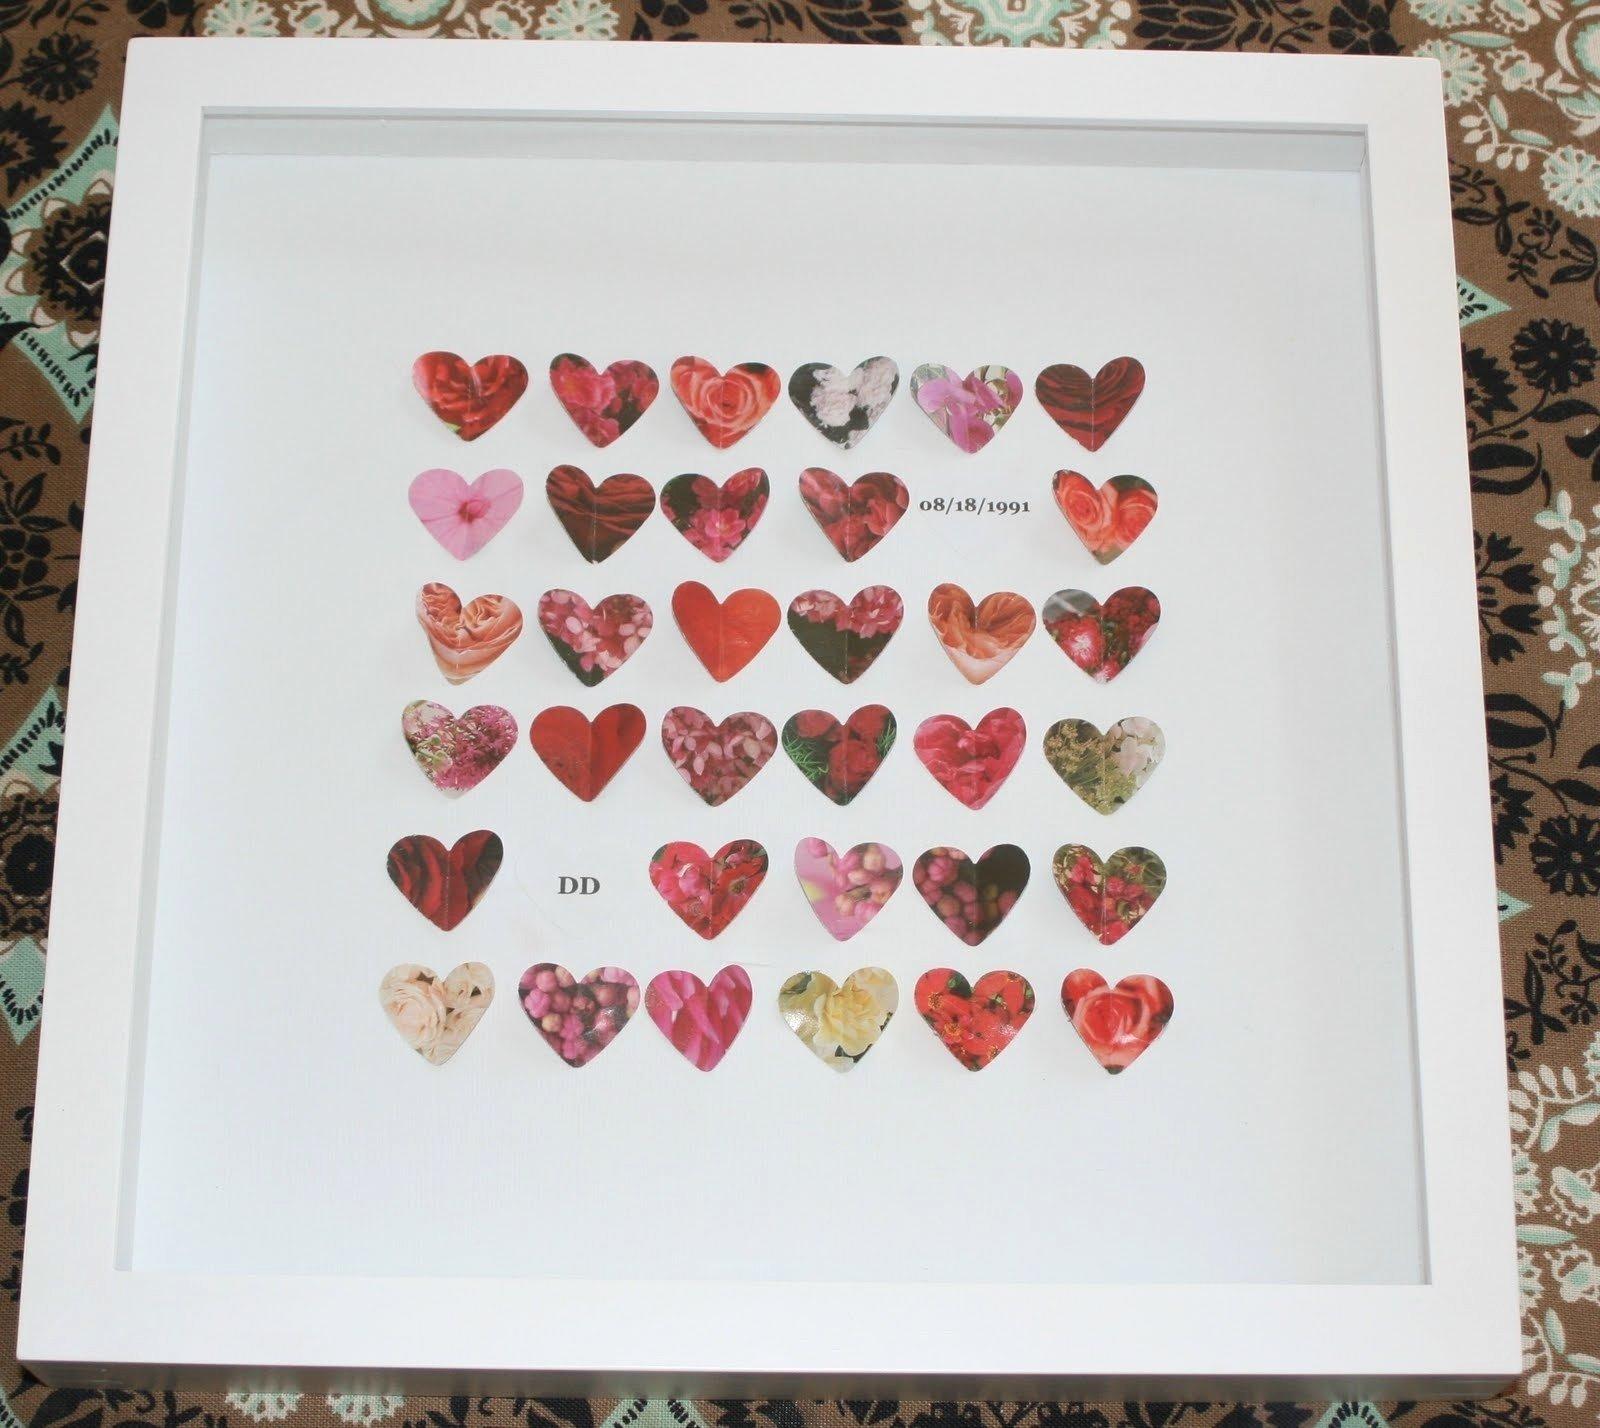 Unique 35 Wedding Anniversary Gift For Parents Crest Wedding Idea